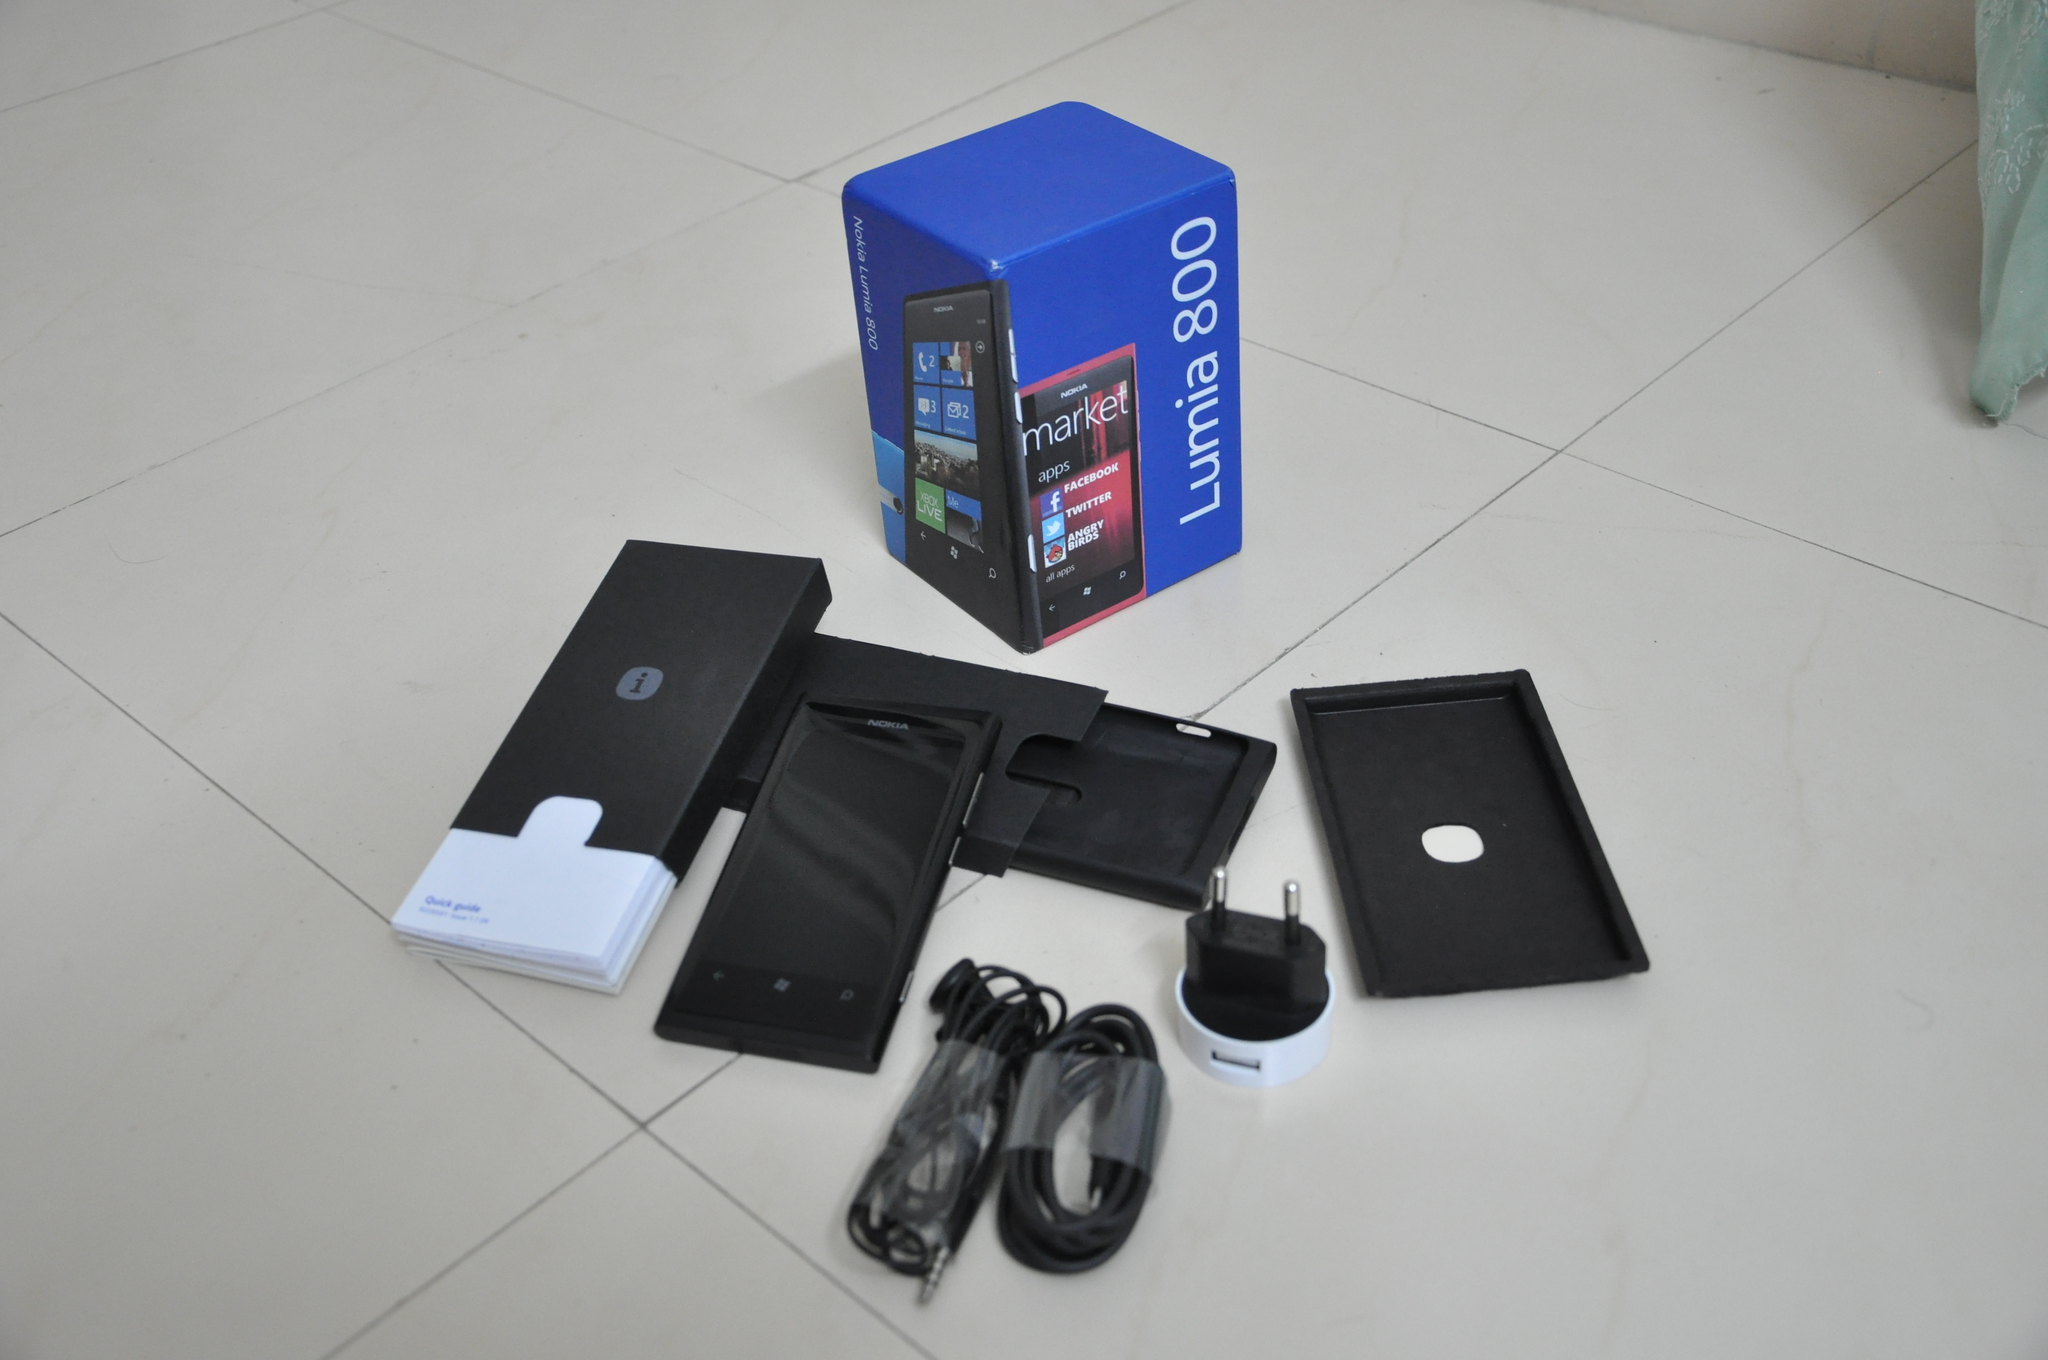 Nokia Lumia 800 contents